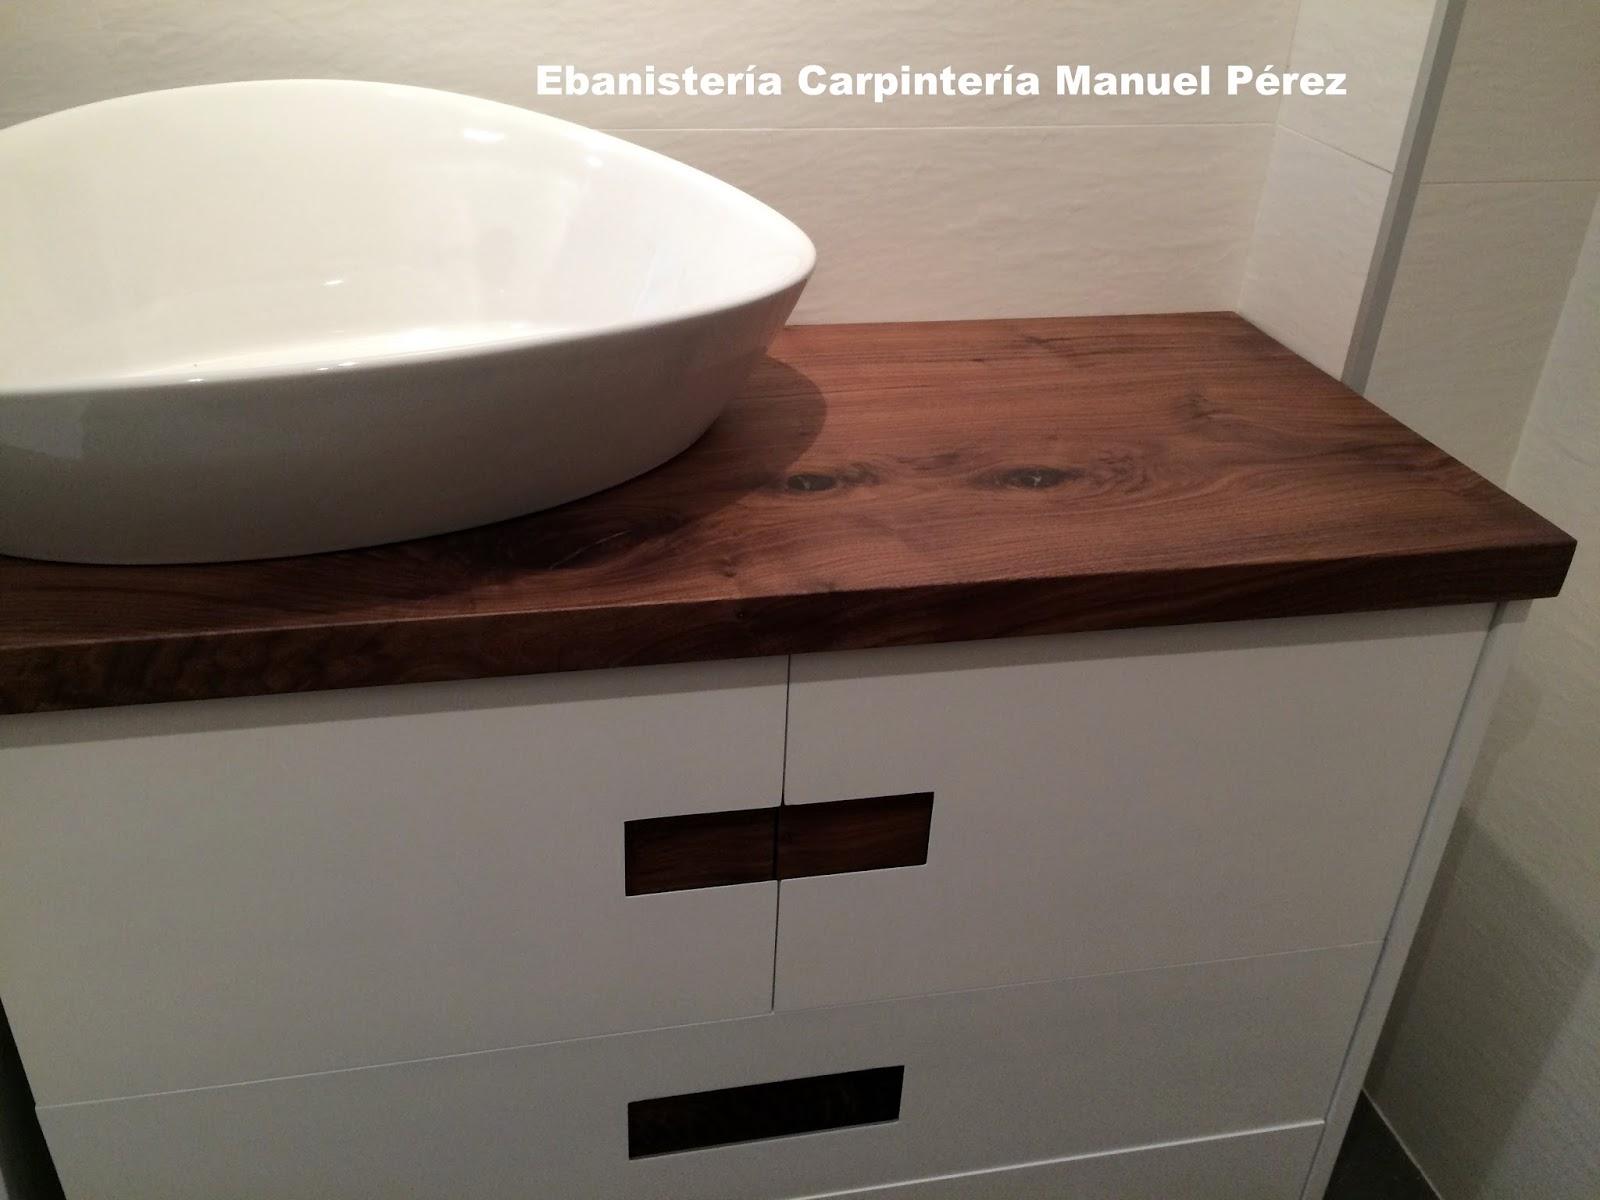 Ebanisteria carpinteria manuel perez zaragoza mueble - Encimera madera maciza ...